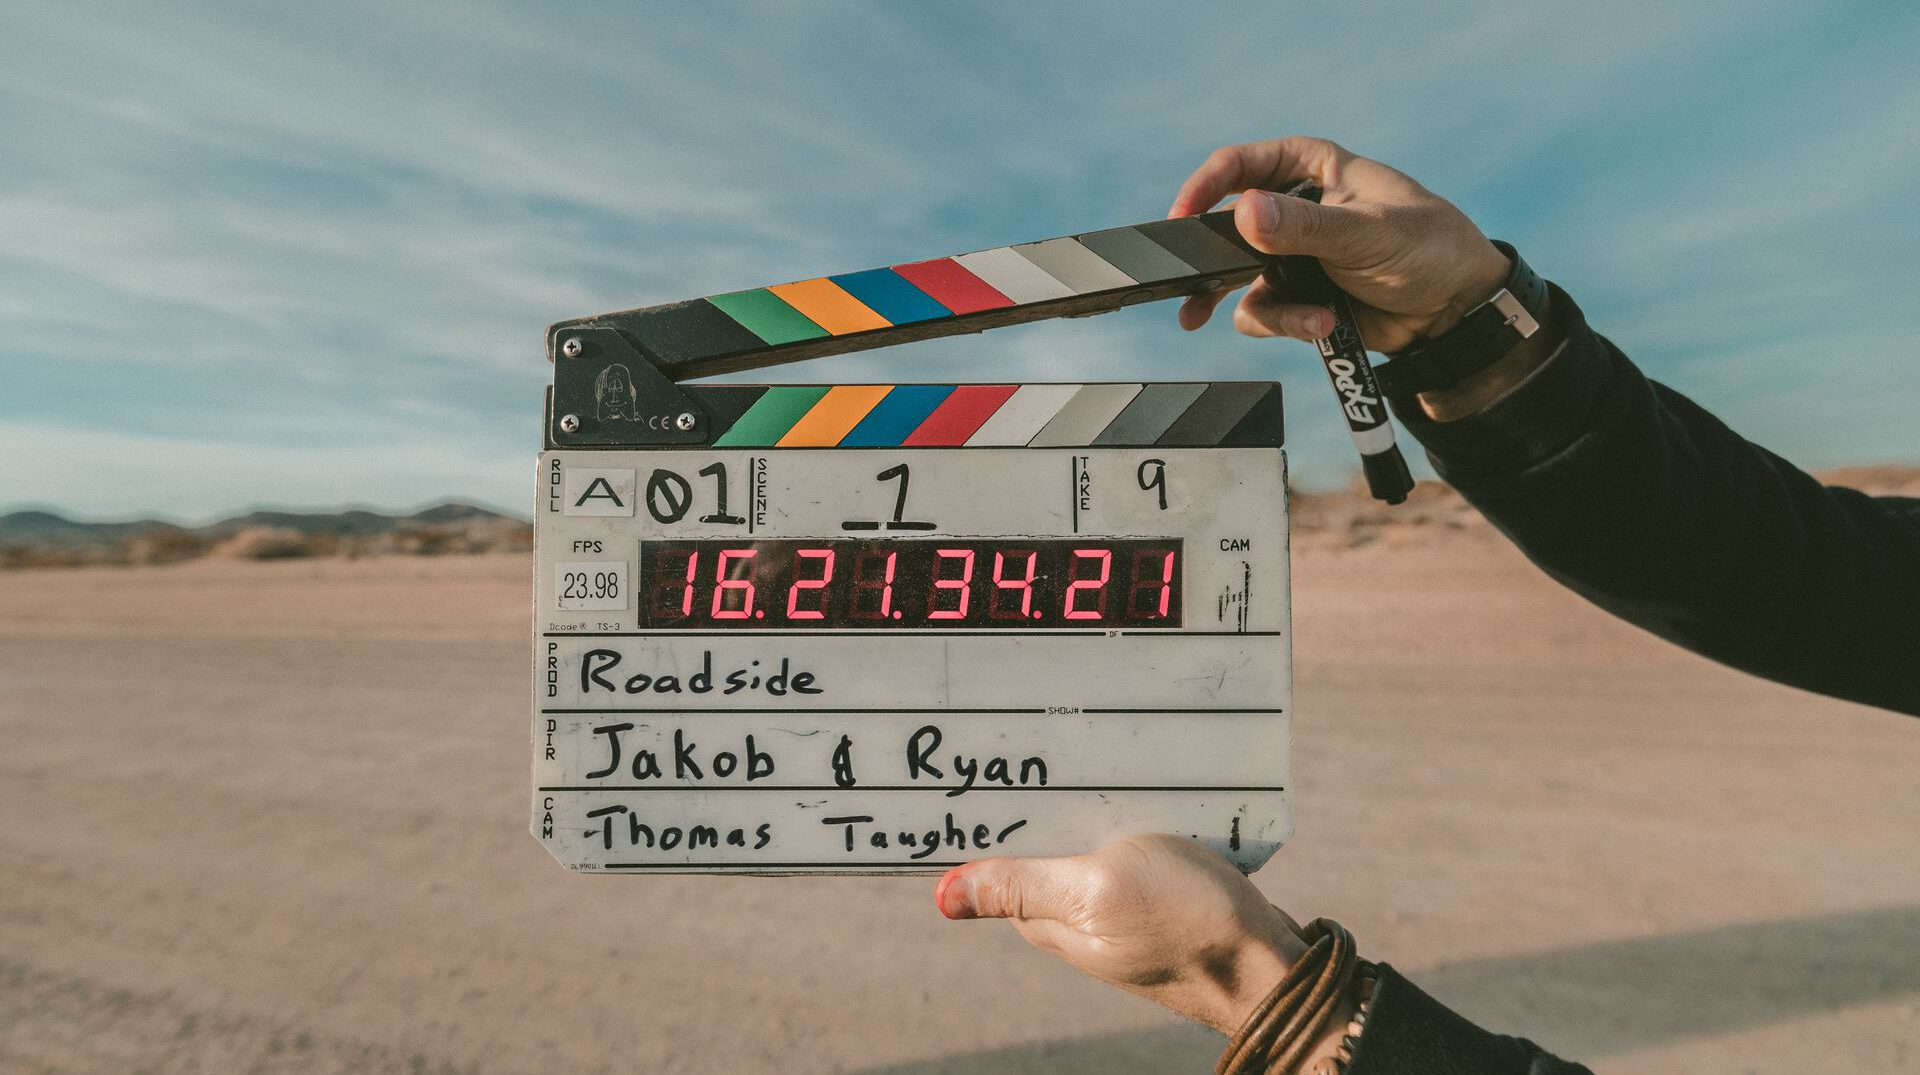 Recording a video.